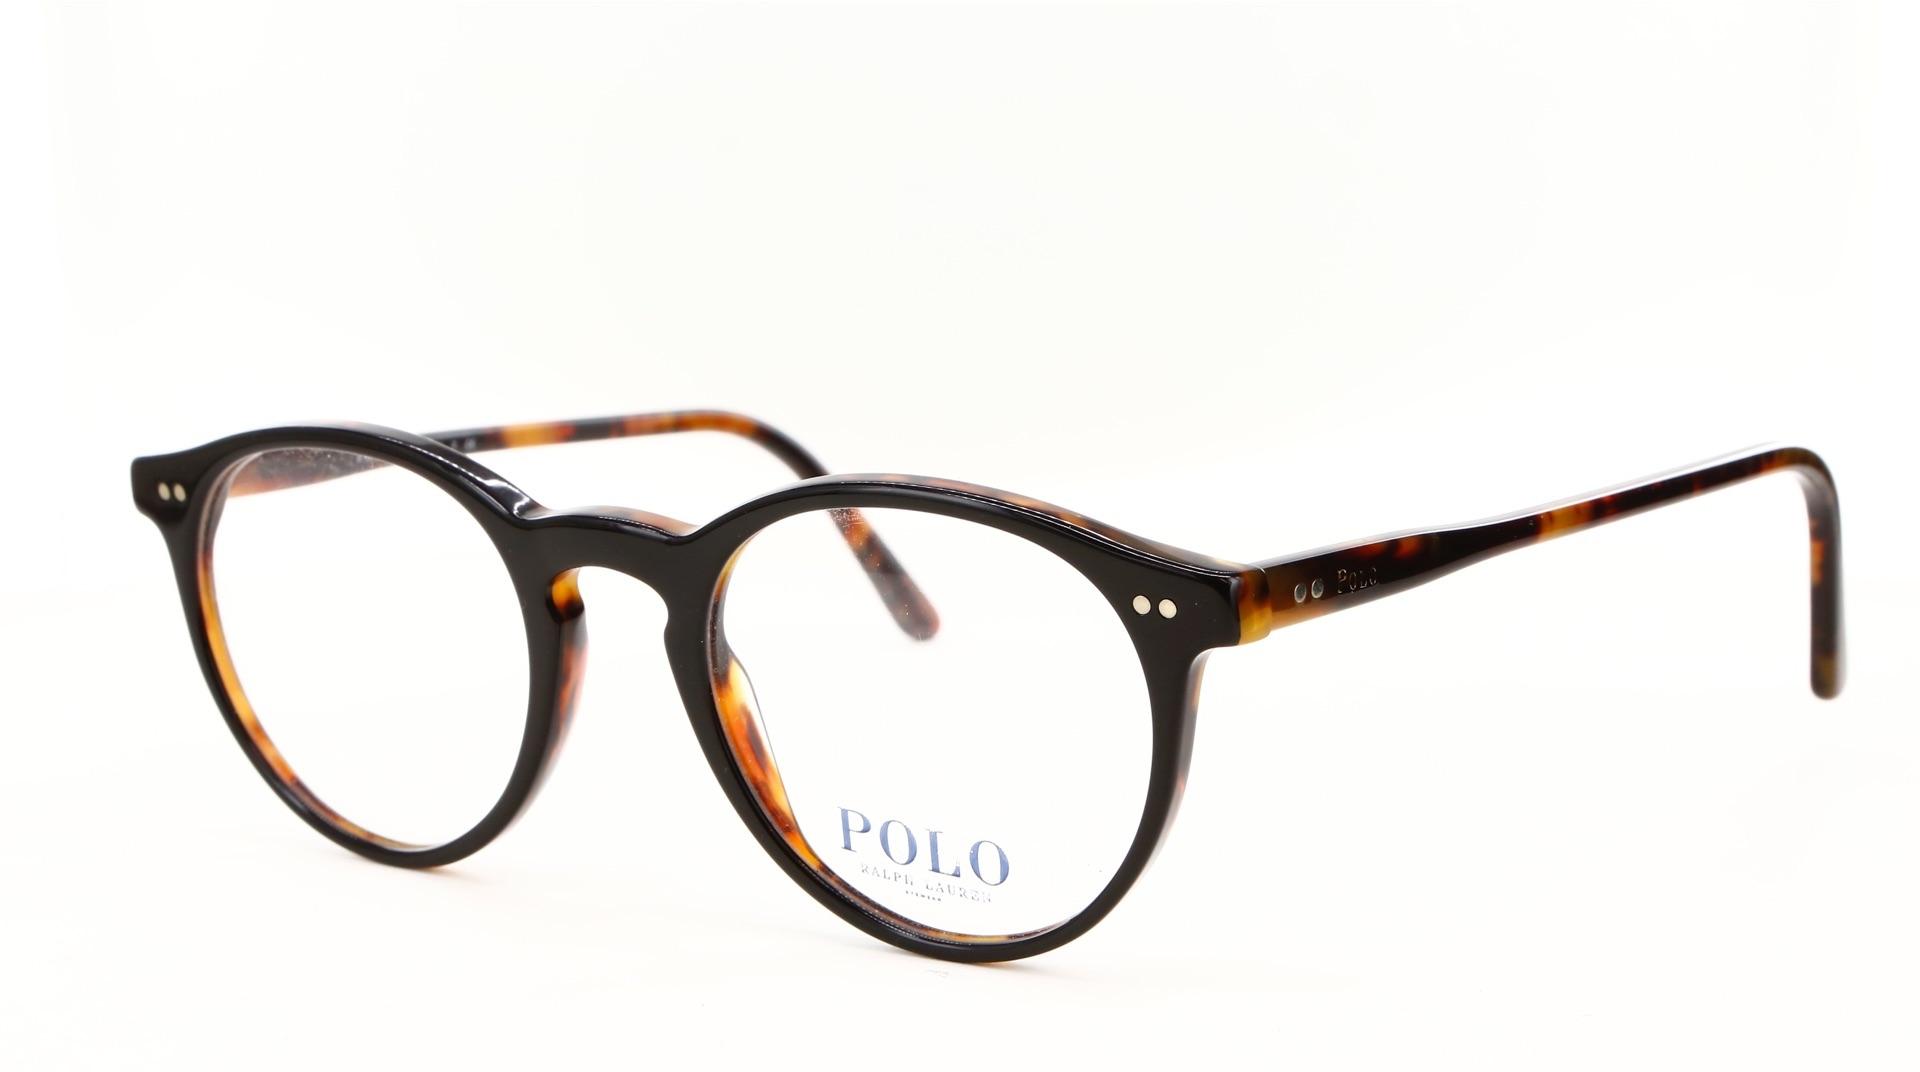 76351 | Polo Ralph Lauren Frames | Claeyssens Optic | Brugge & Gent